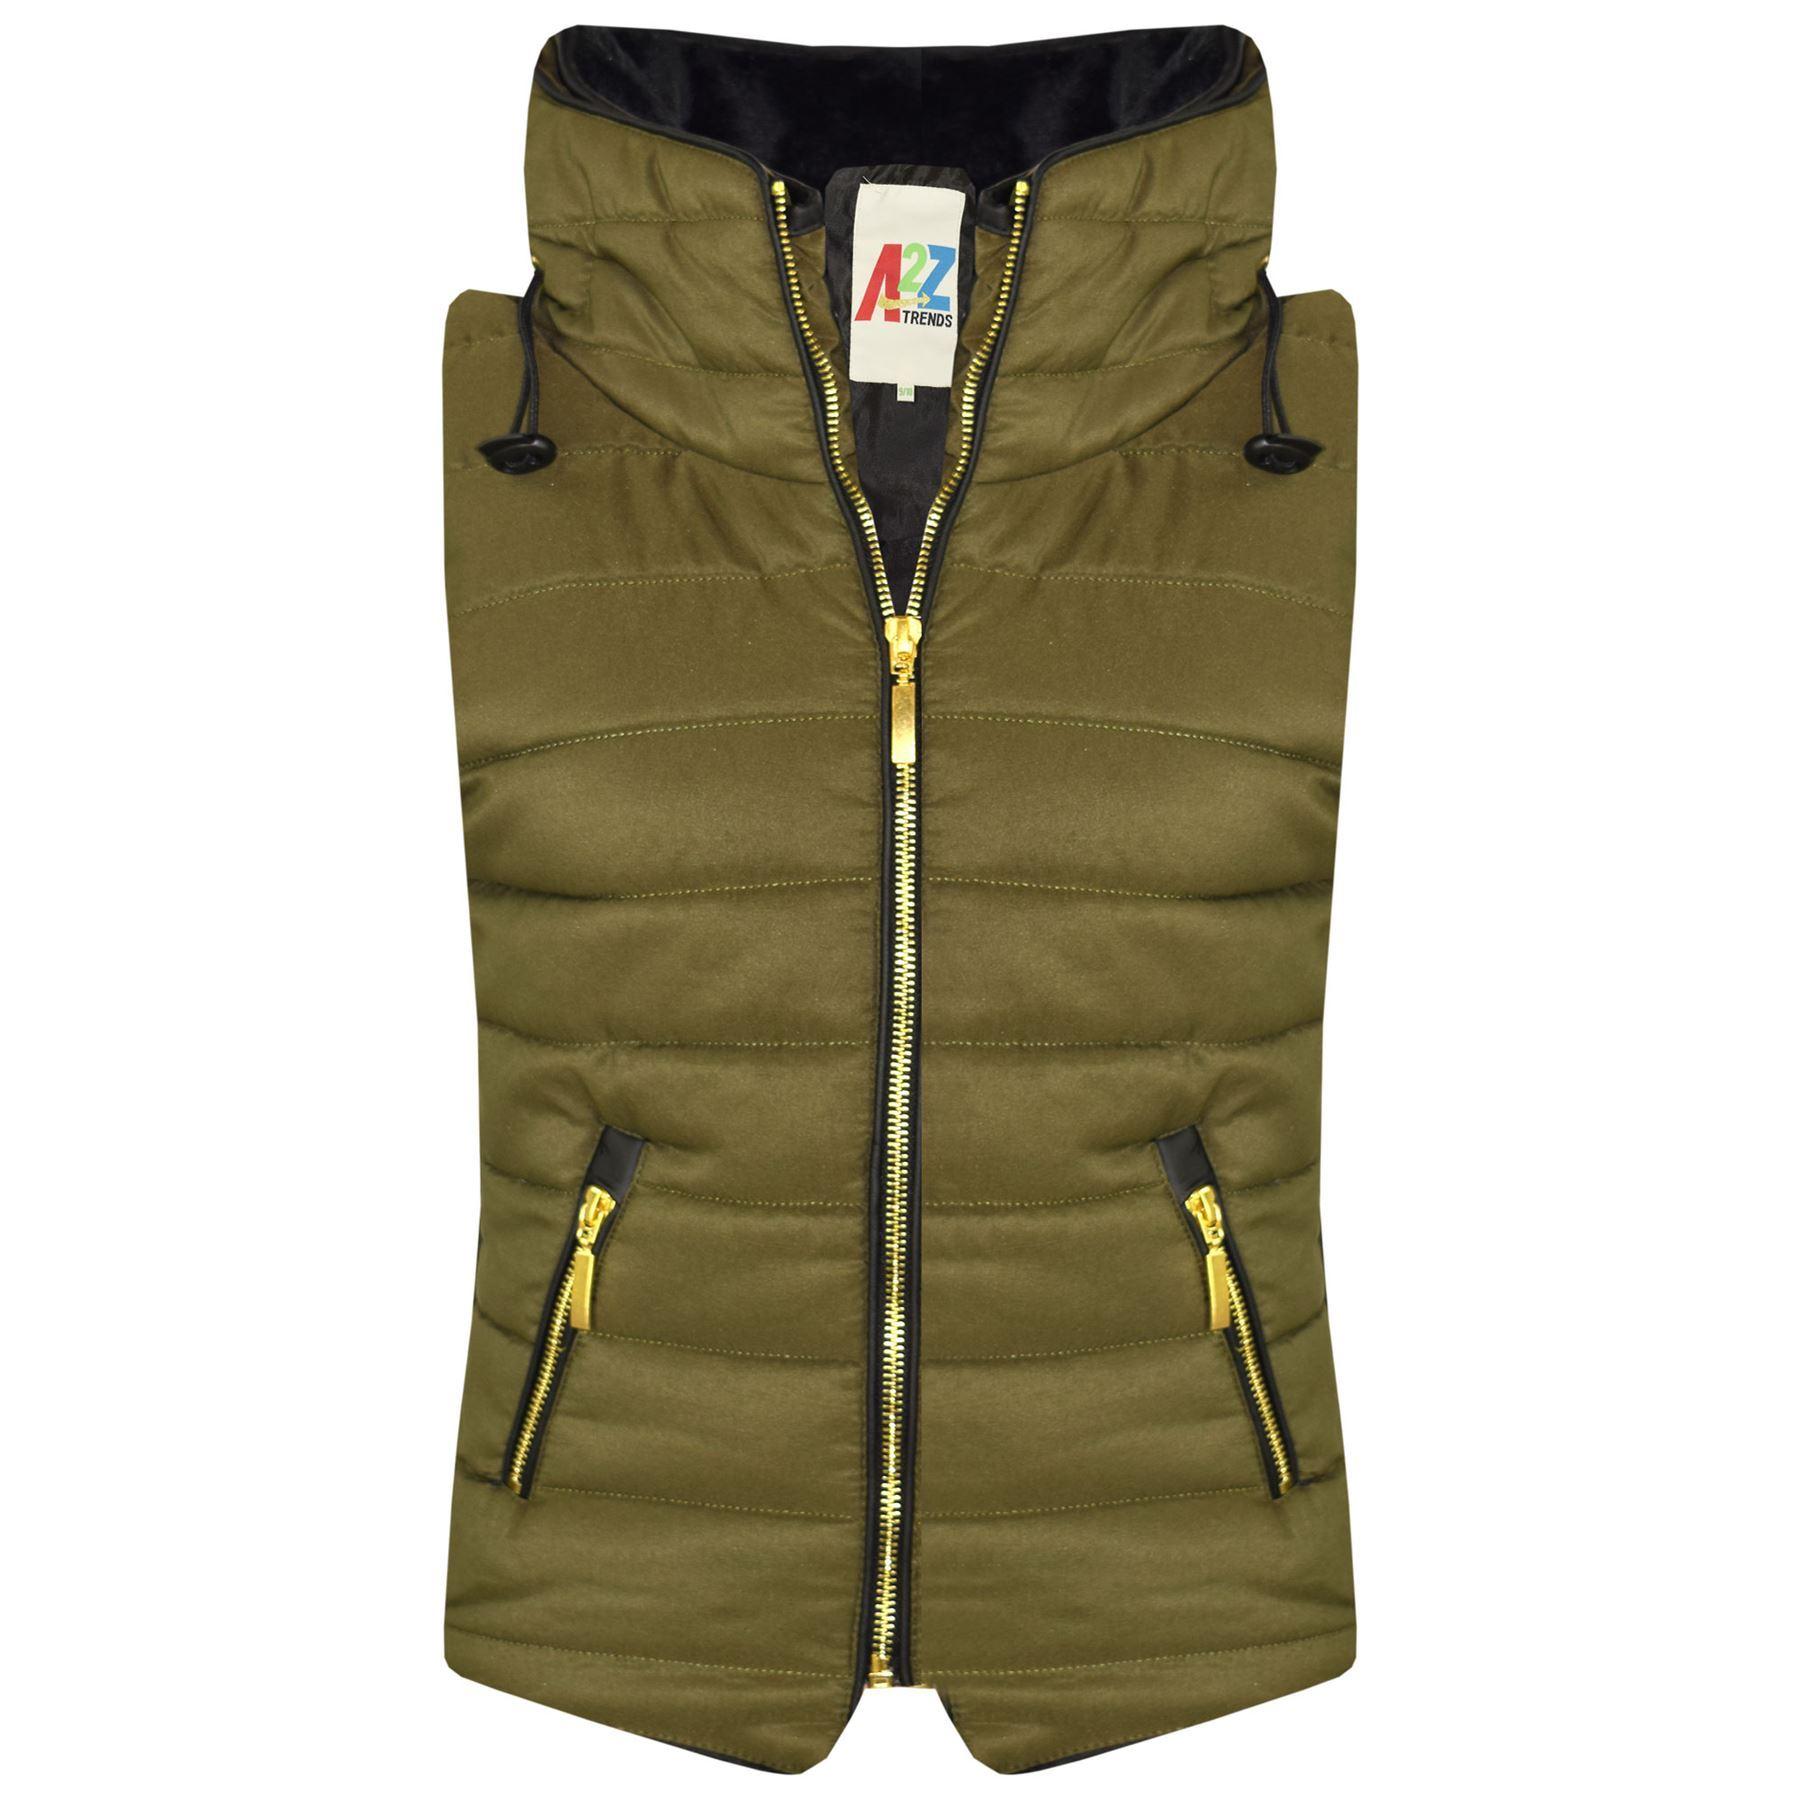 Kids Girls Boys Olive Puffer Bubble Sleeveless Hooded Gilets Body Warmer Jackets